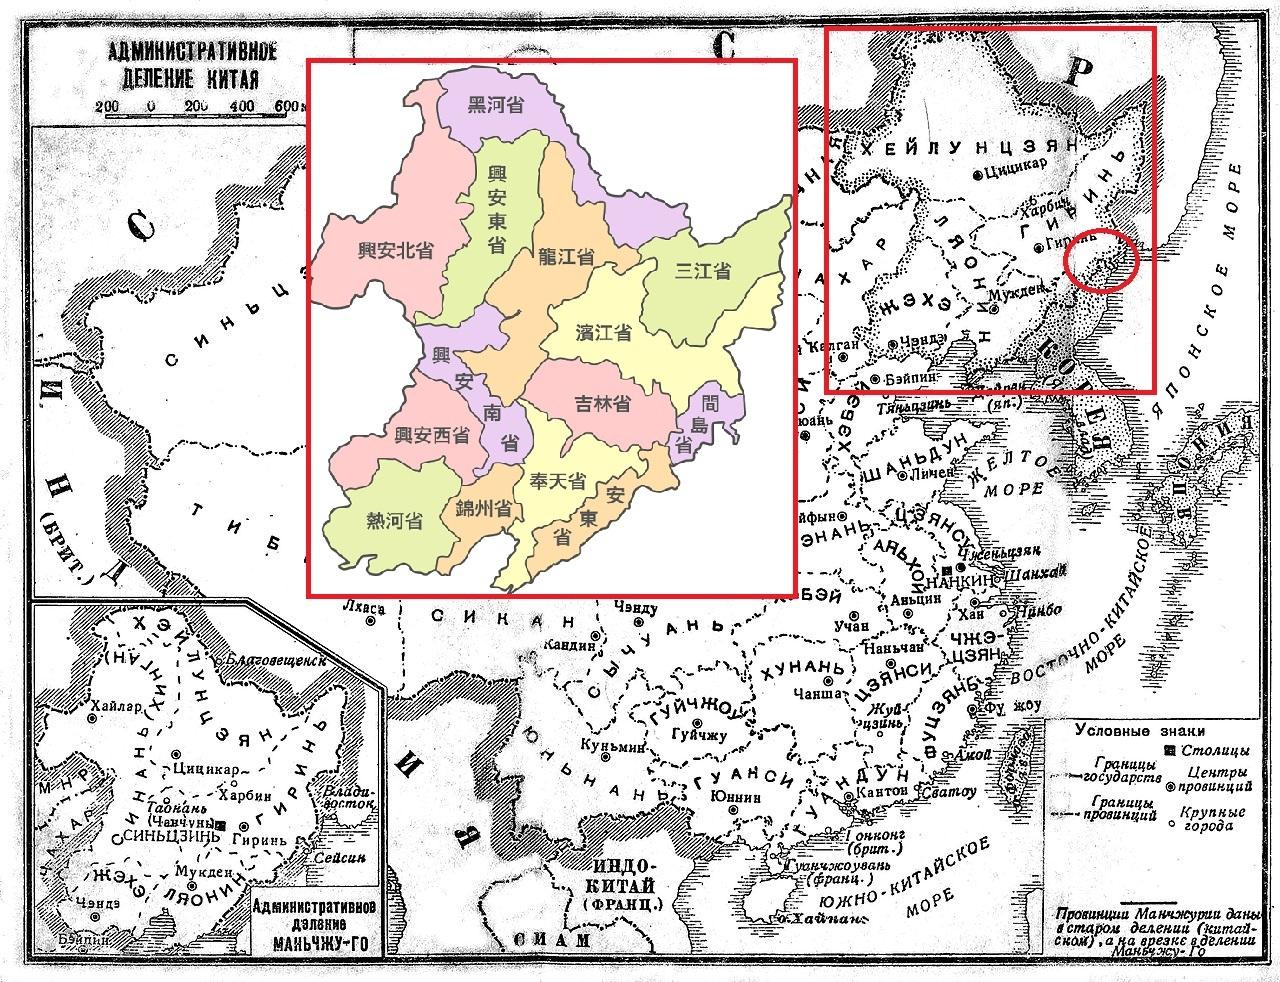 満洲国の地方行政区画